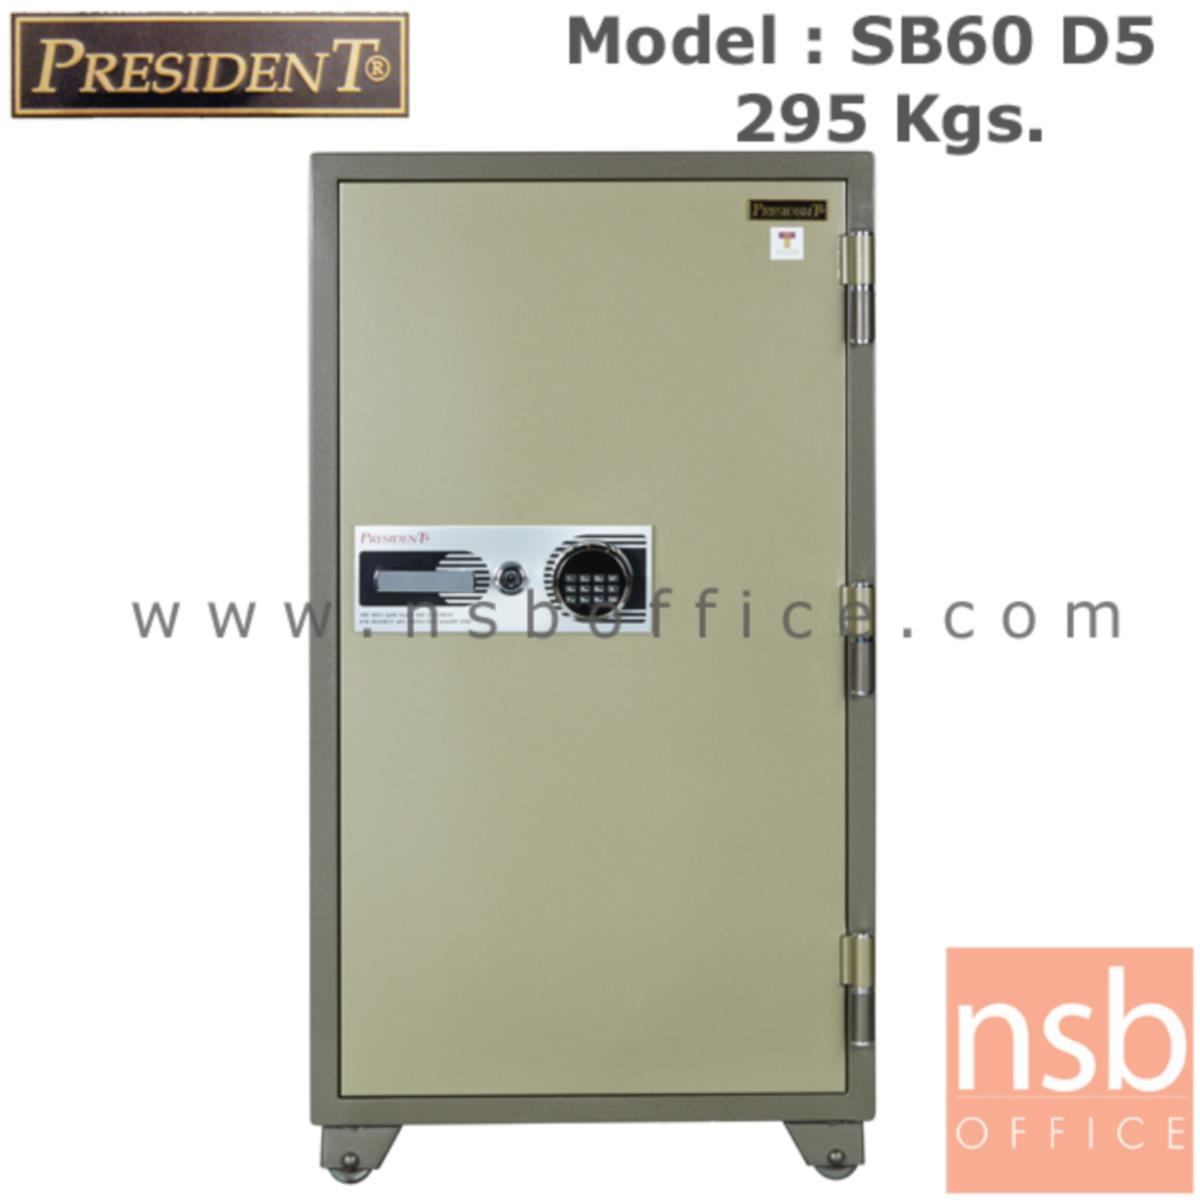 F05A064: ตู้เซฟนิรภัยชนิดดิจิตอลแบบใหม่ 295 กก.  รุ่น PRESIDENT-SB60D5  มี 1 กุญแจ 1 รหัส (รหัสใช้กดหน้าตู้)